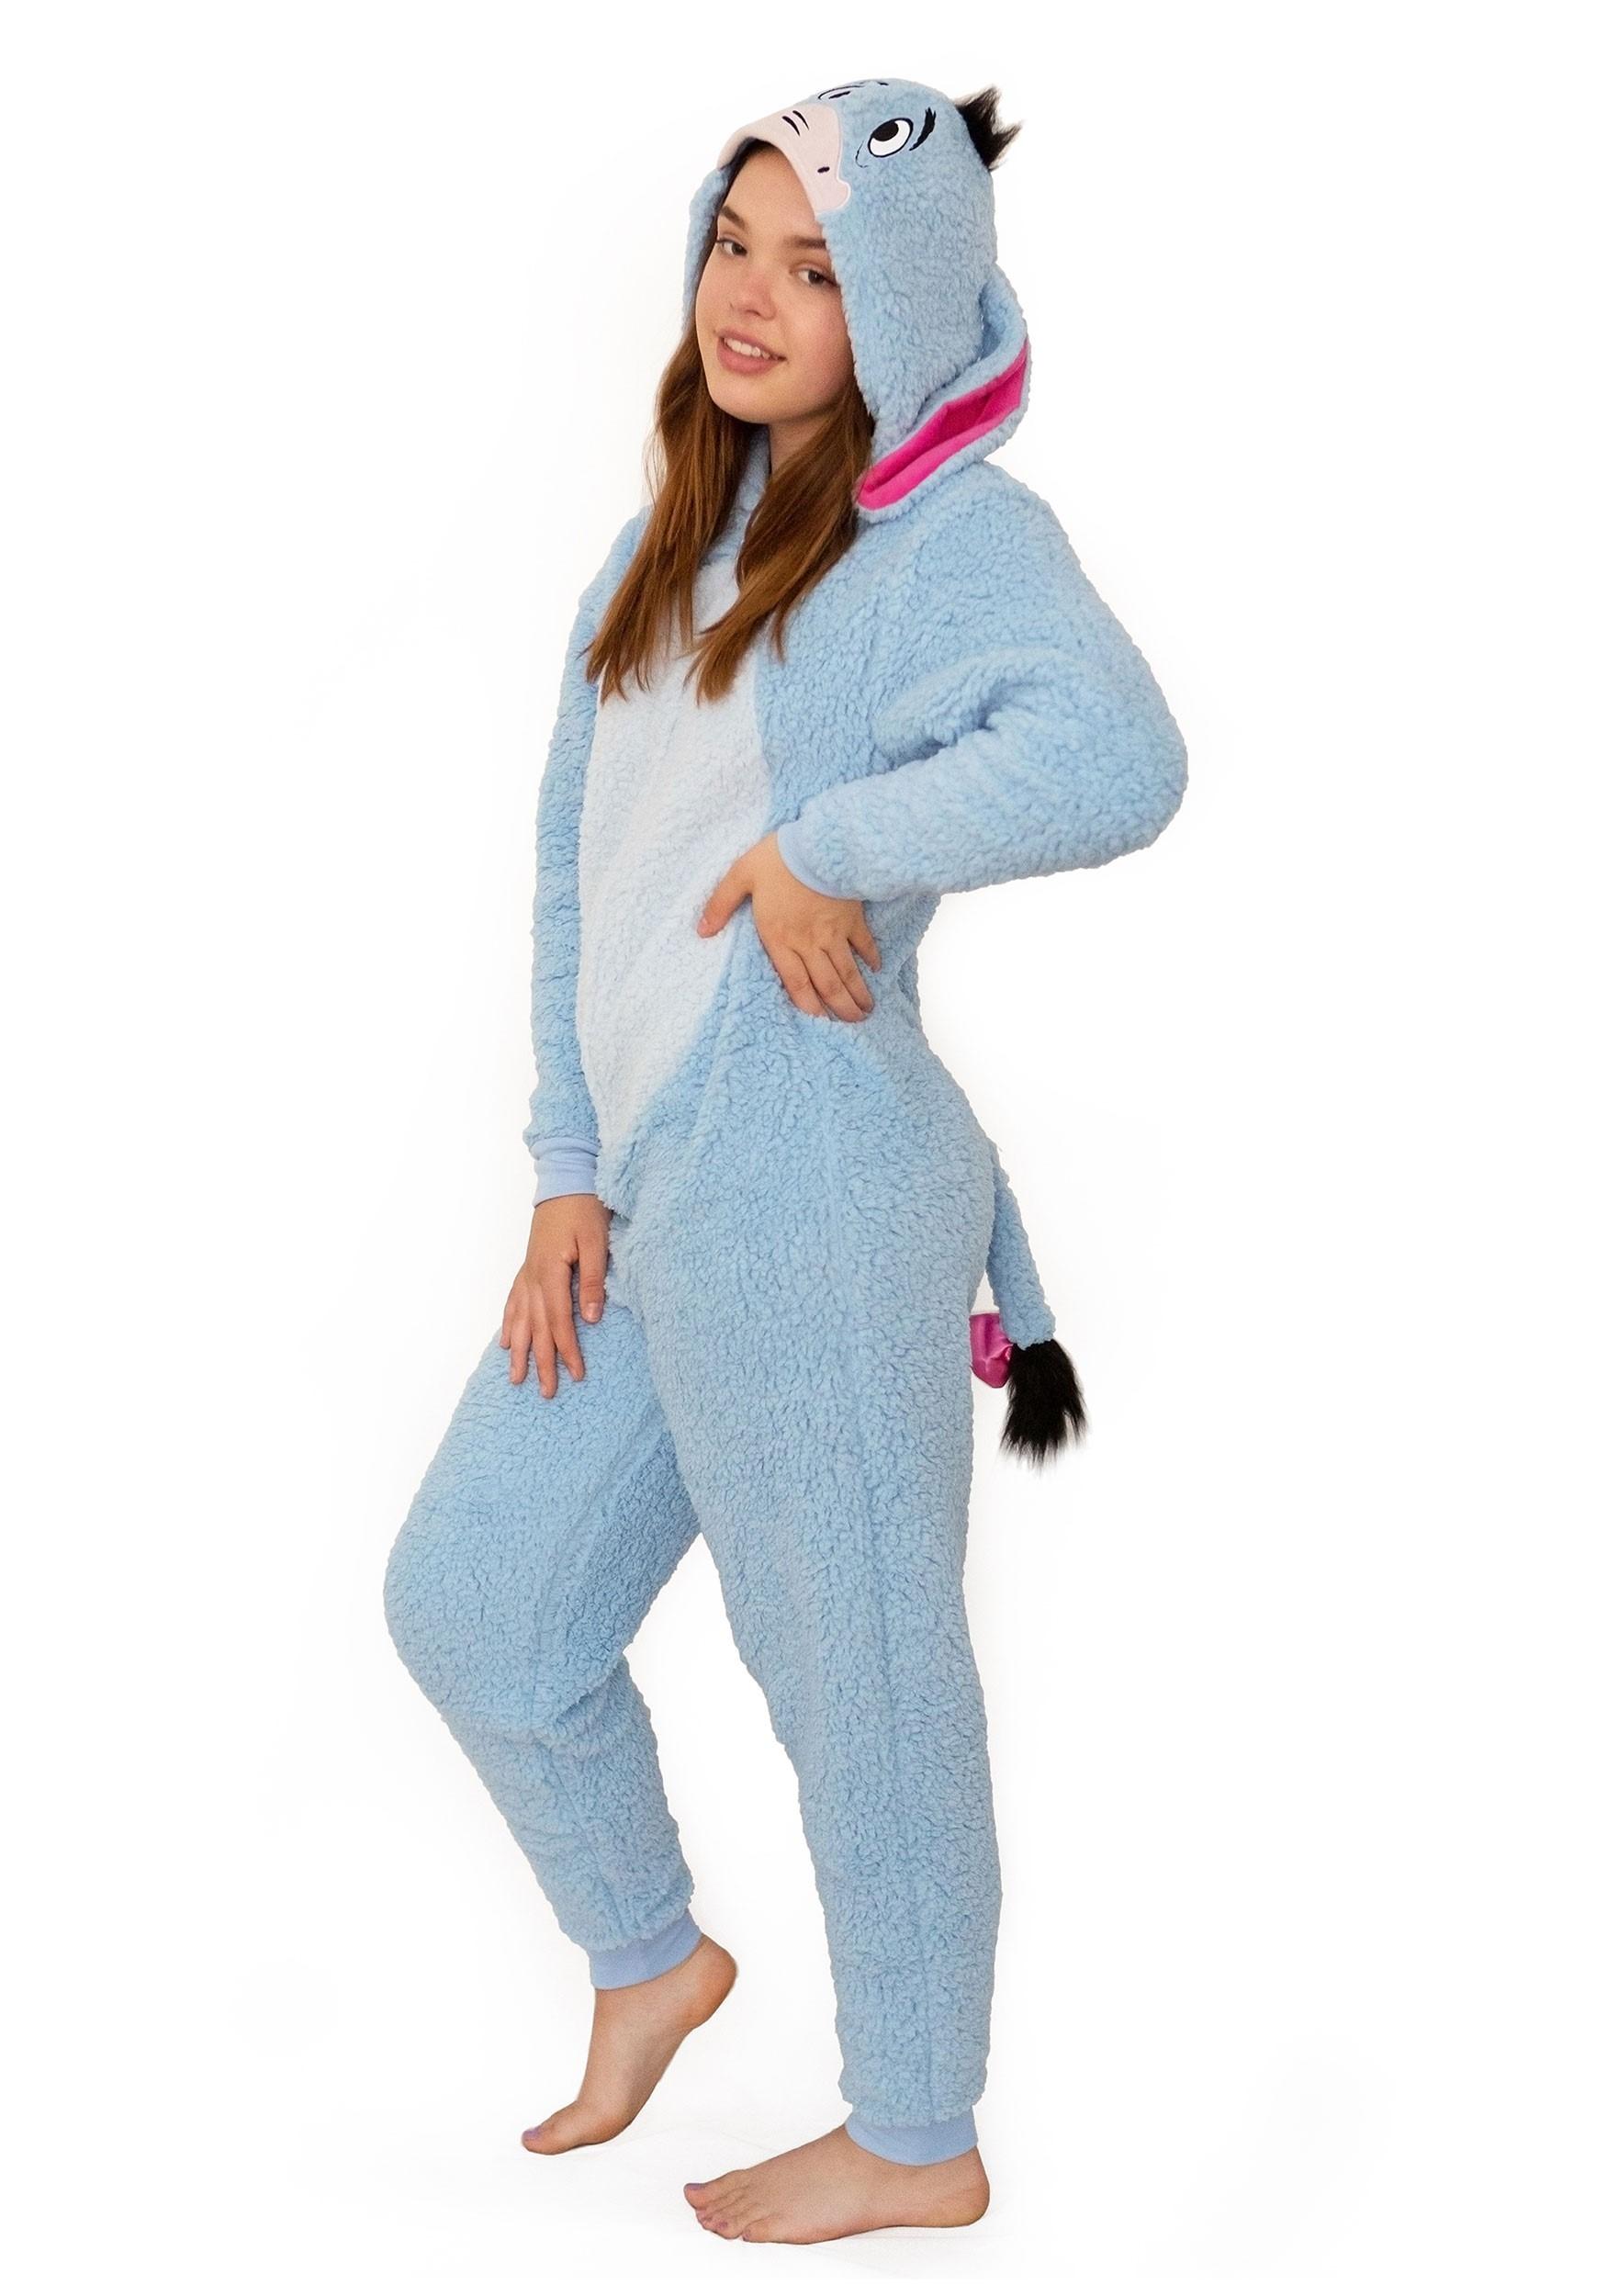 Winnie the Pooh Eeyore Union Suit Women's Costume